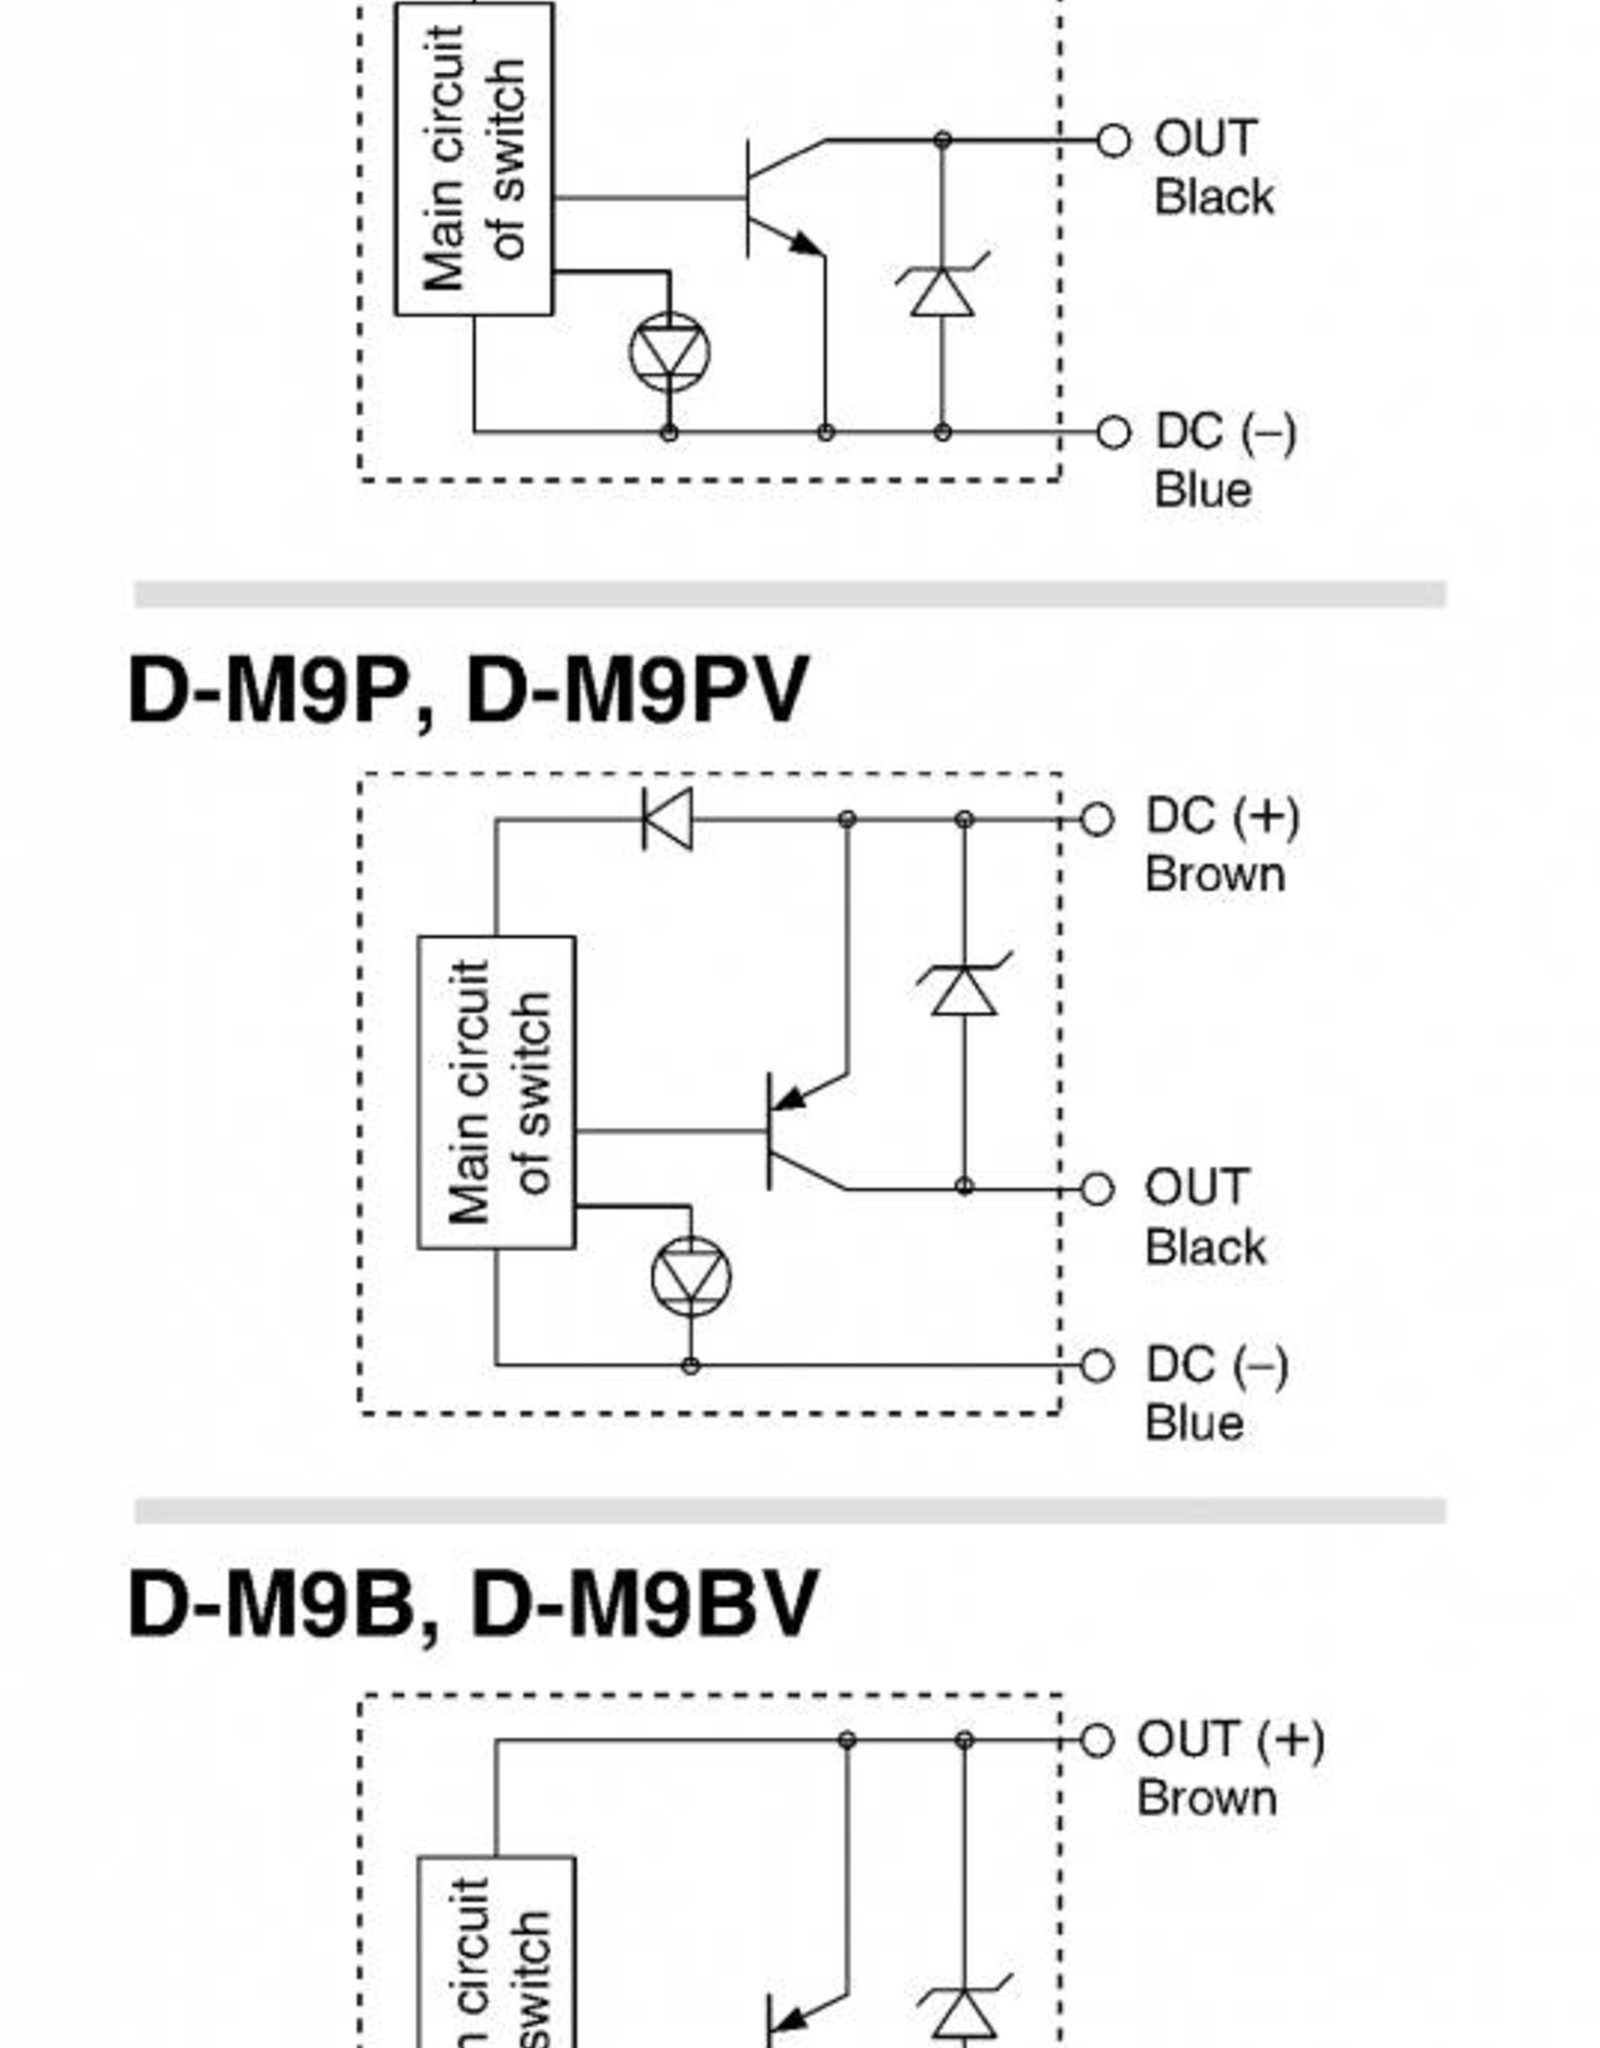 direct mount NPN out 4.5 to 28V Red LED SMC D-M9N Solid state sensor